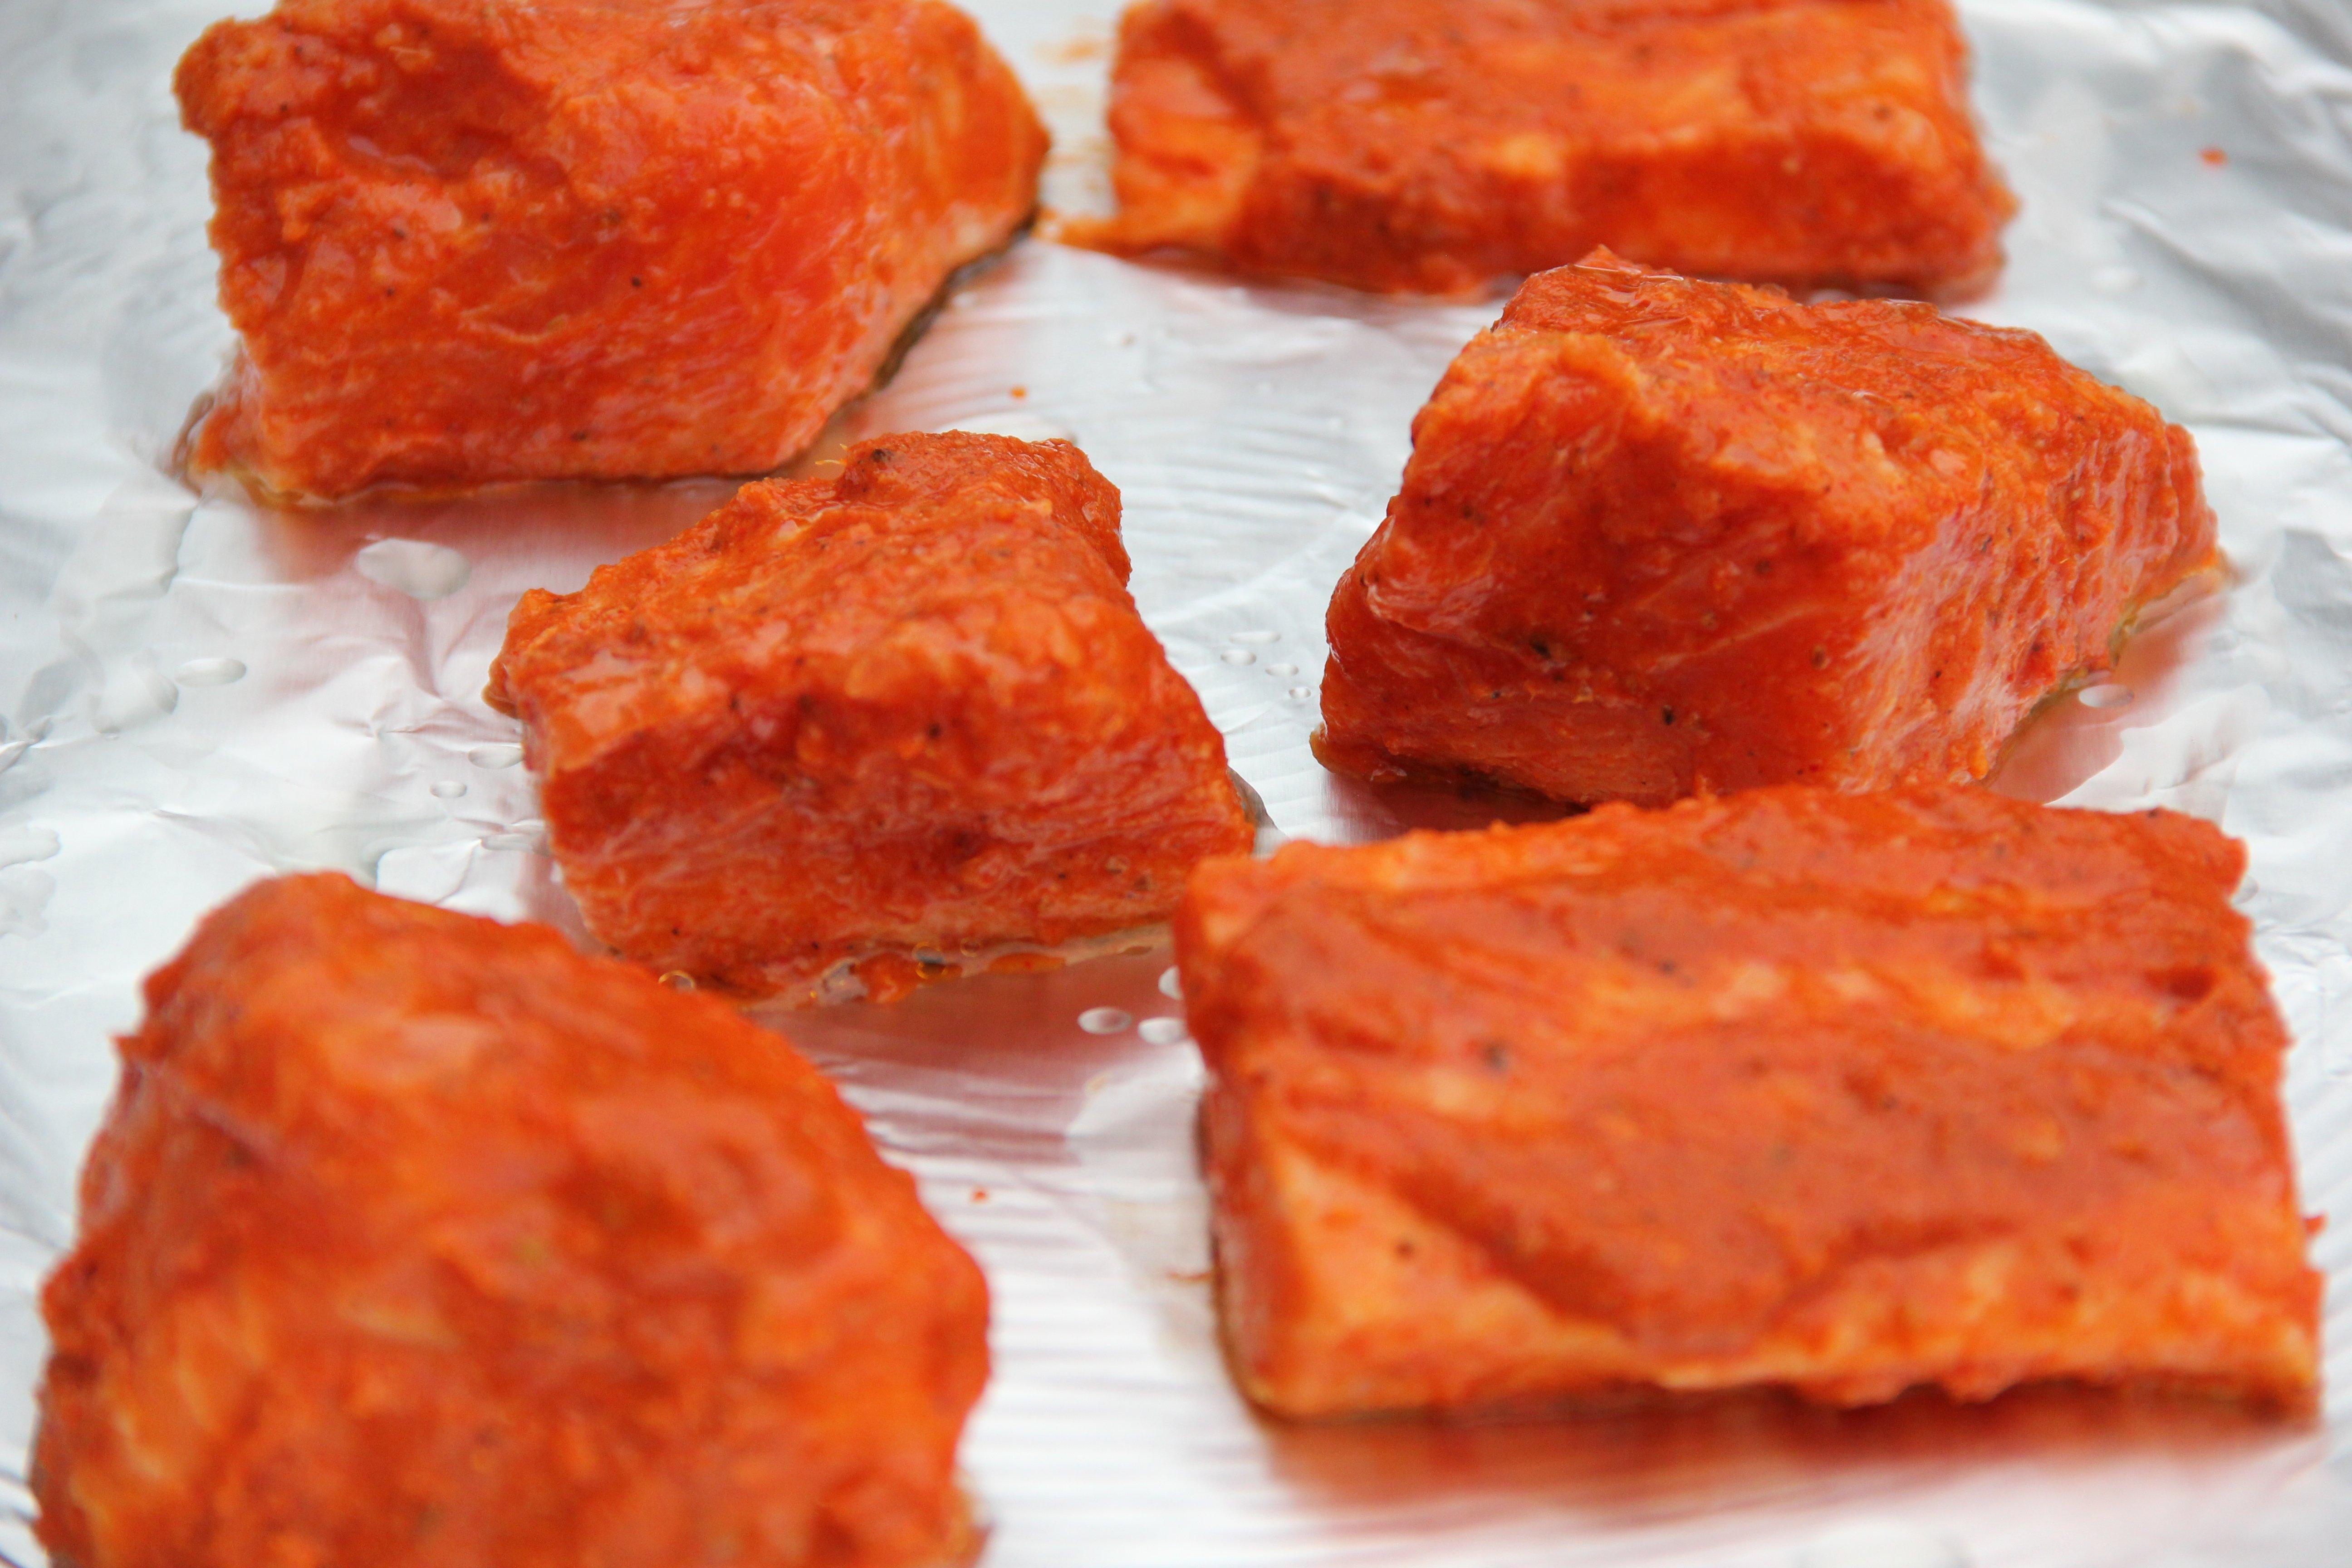 Tandoori salmon - ready to be grilled